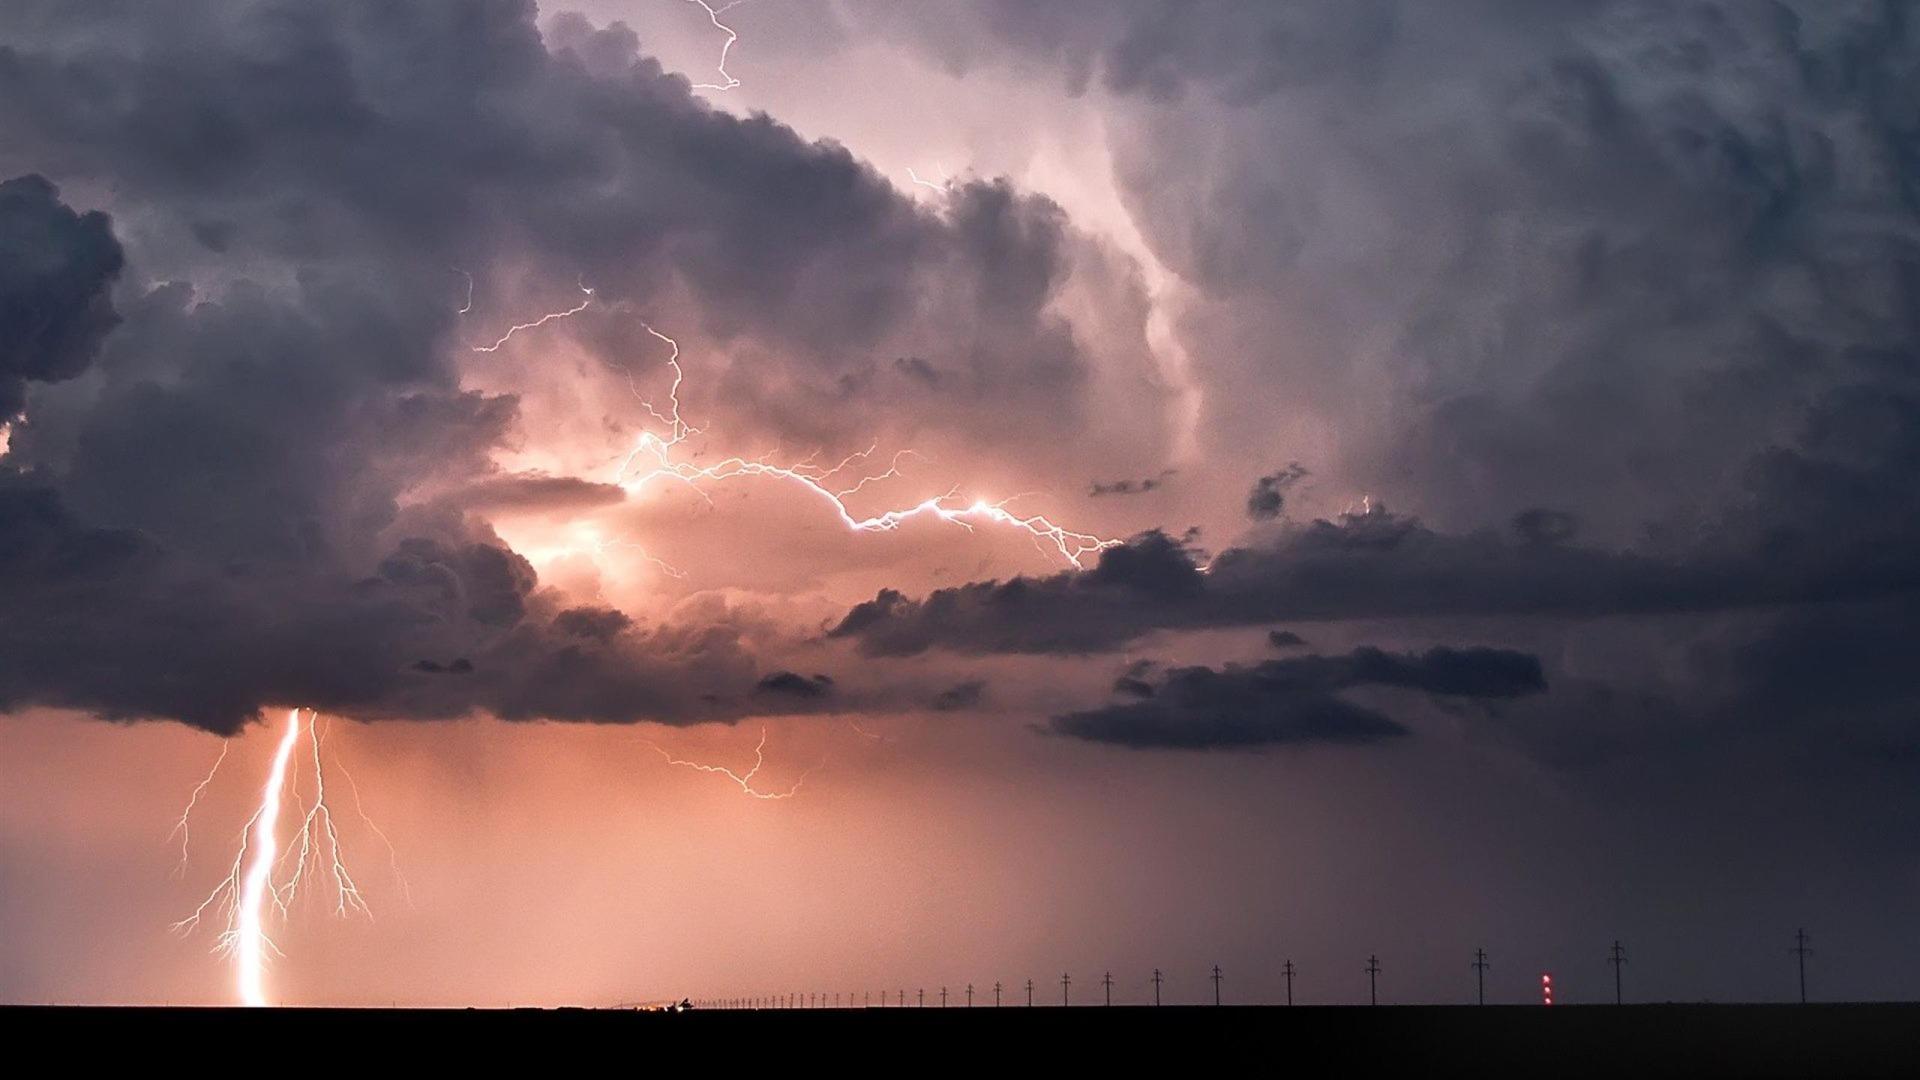 Thunderstorm Wallpaper 1920x1080px #905036